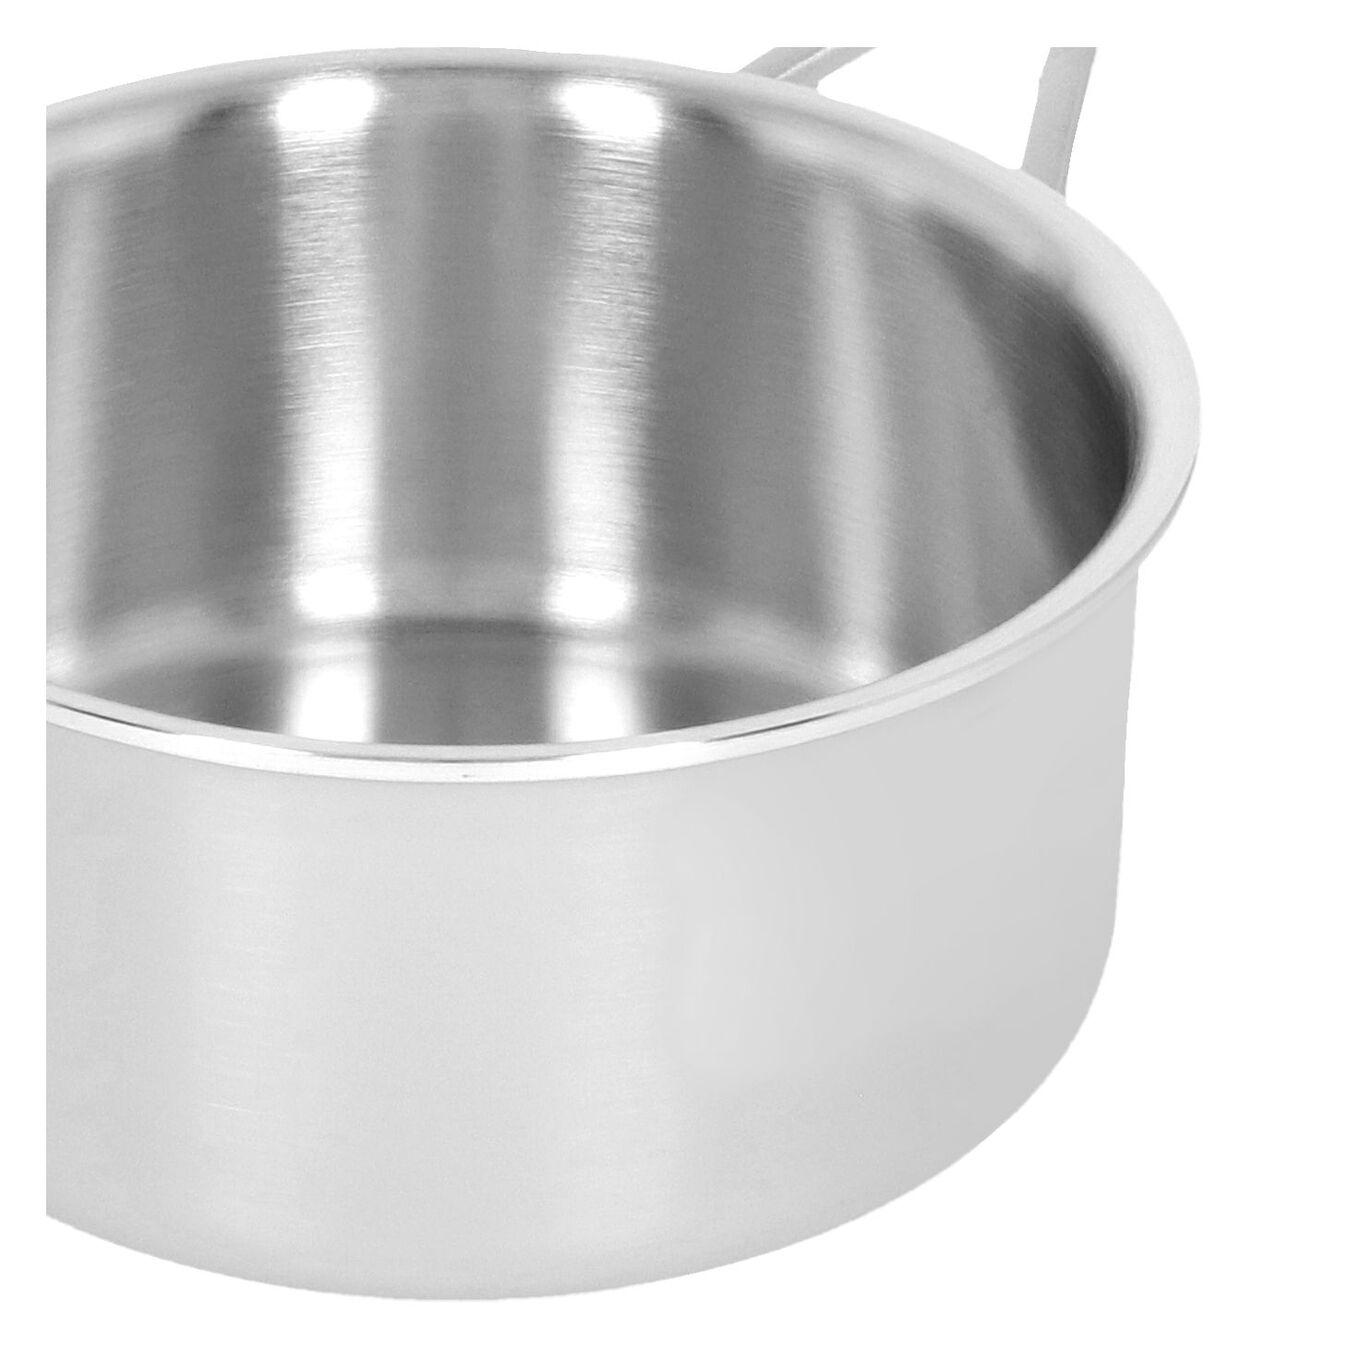 Kasserolle Uden låg 16 cm, 18/10 rustfrit stål,,large 2